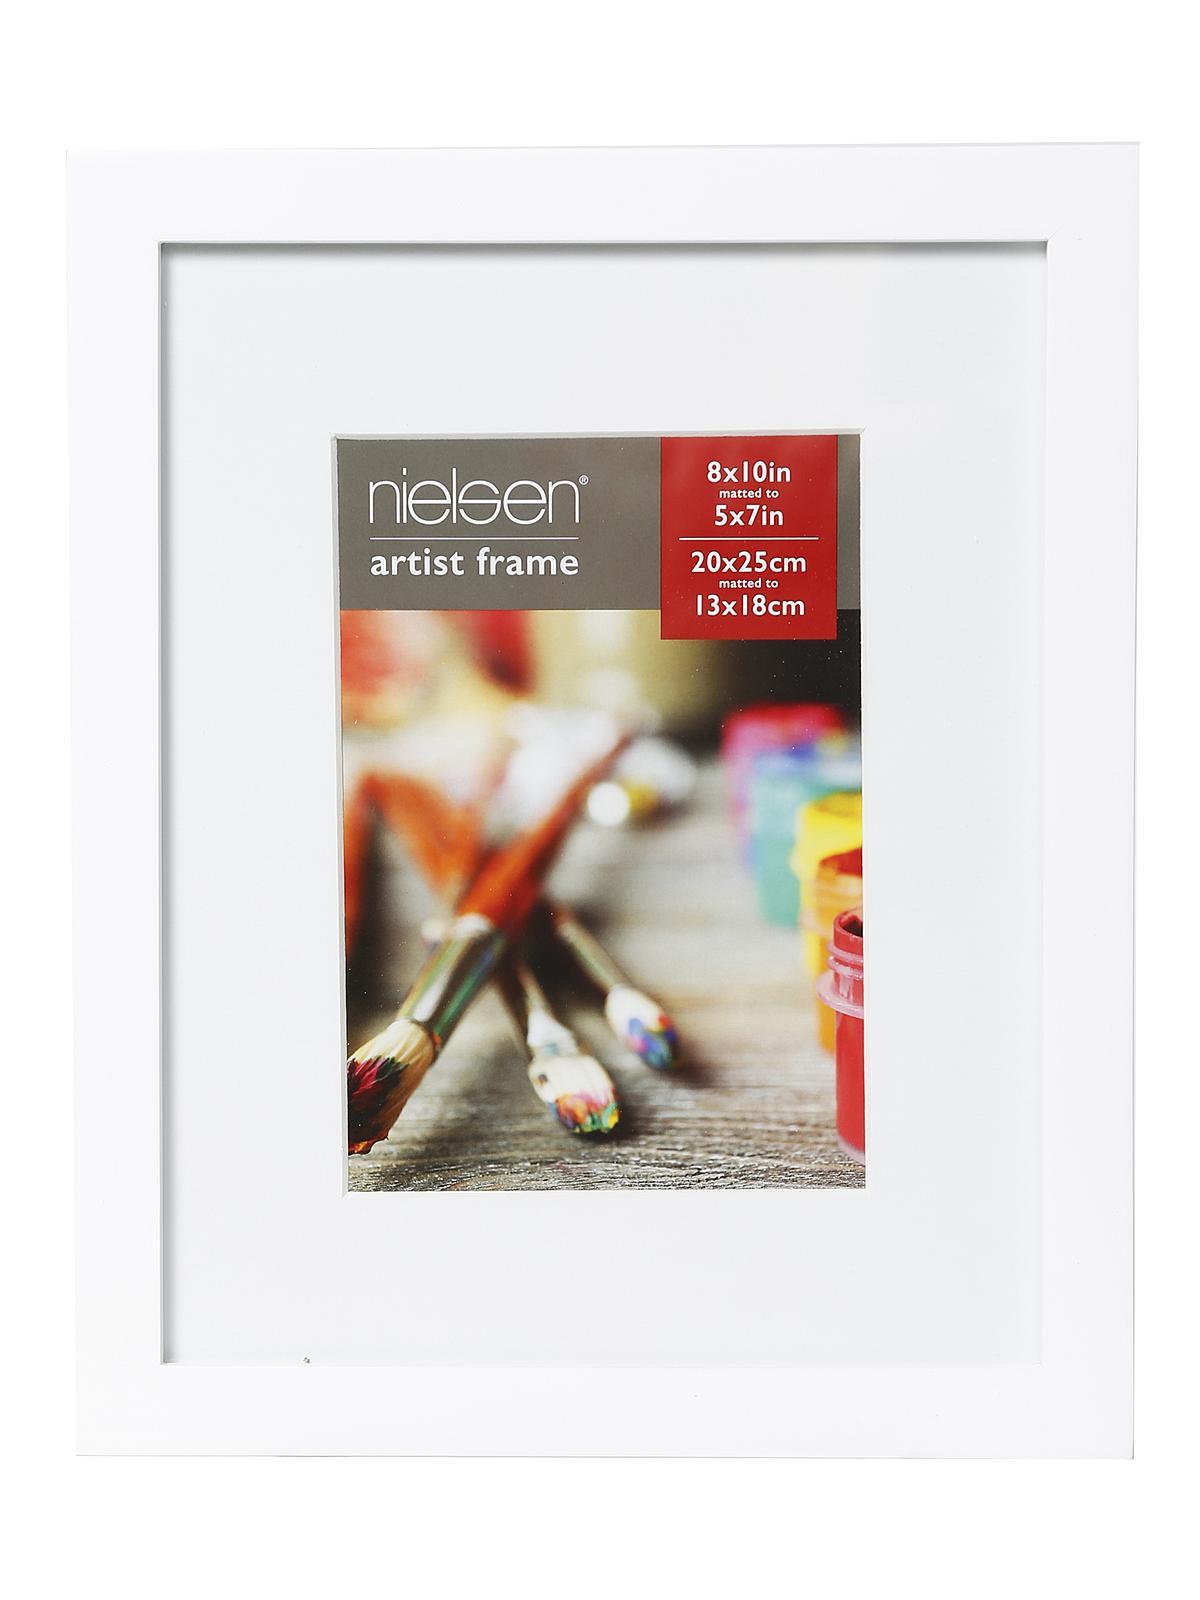 Nielsen Bainbridge Gallery Wood Frames for Canvas   MisterArt.com